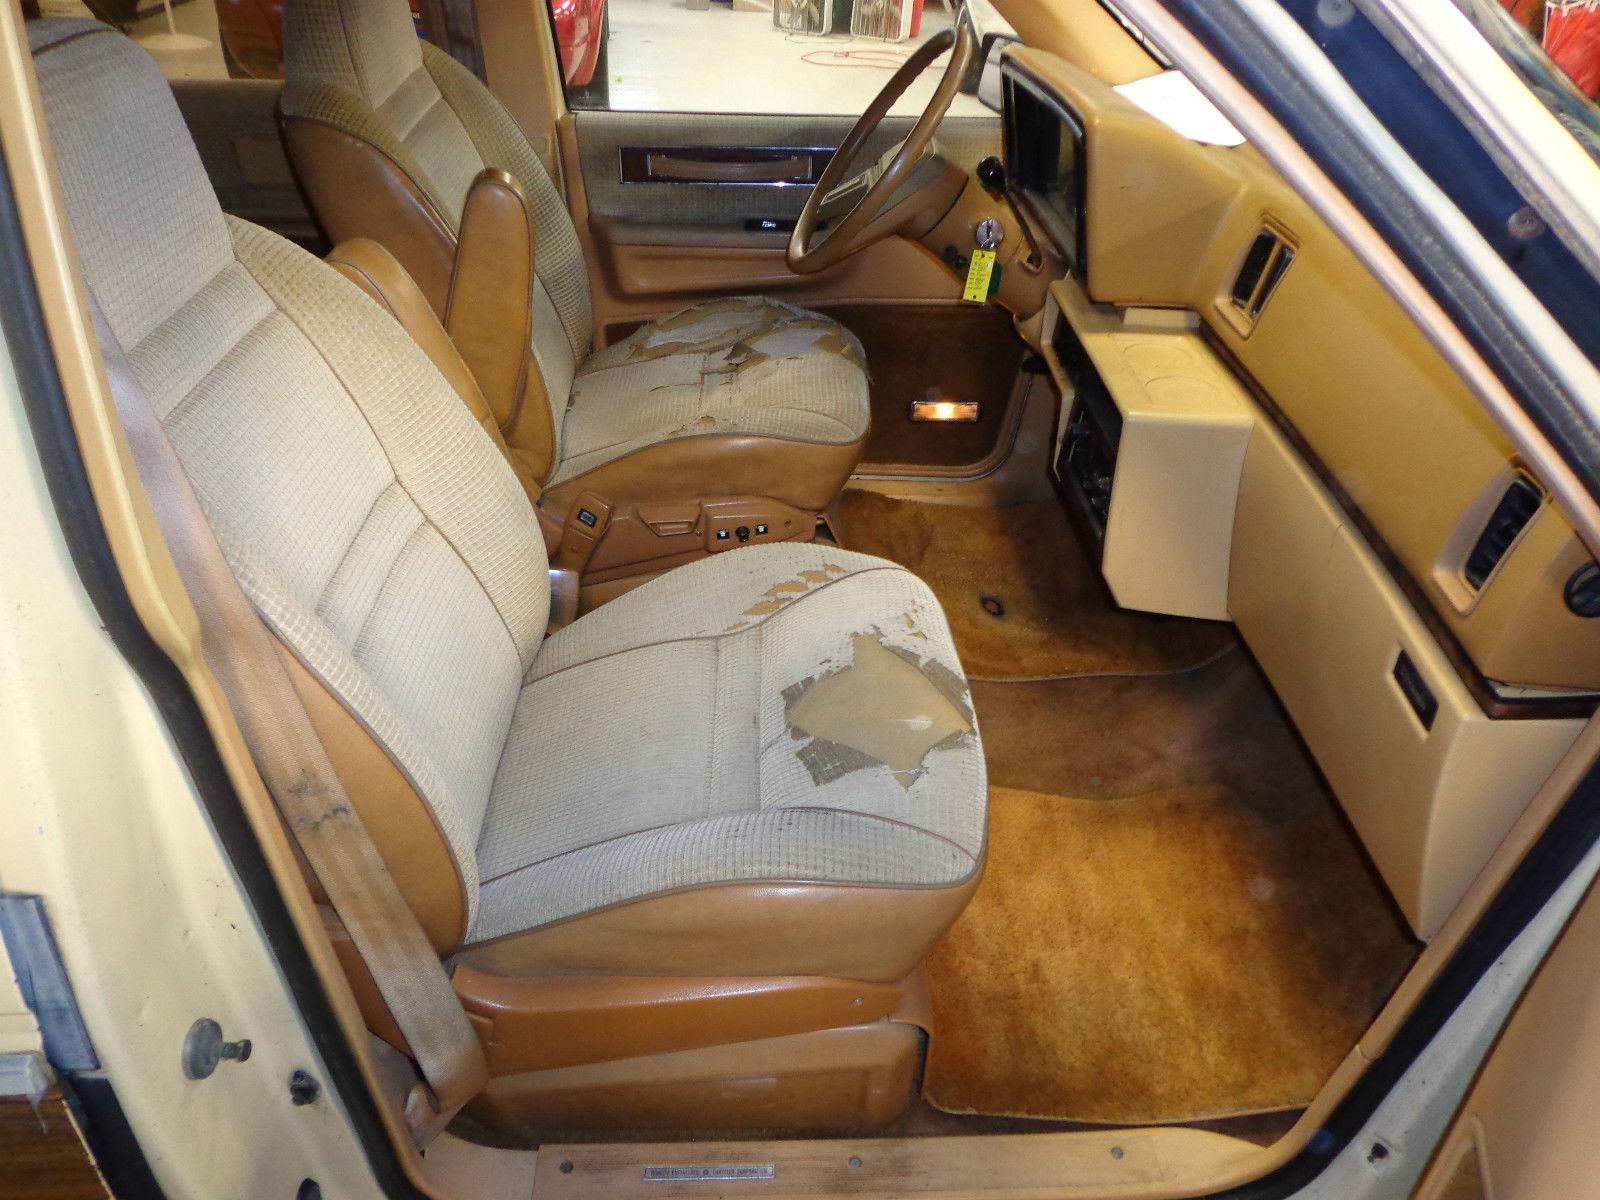 1985 Plymouth Voyager Le Mini Passenger Van 3 Door 2 6l